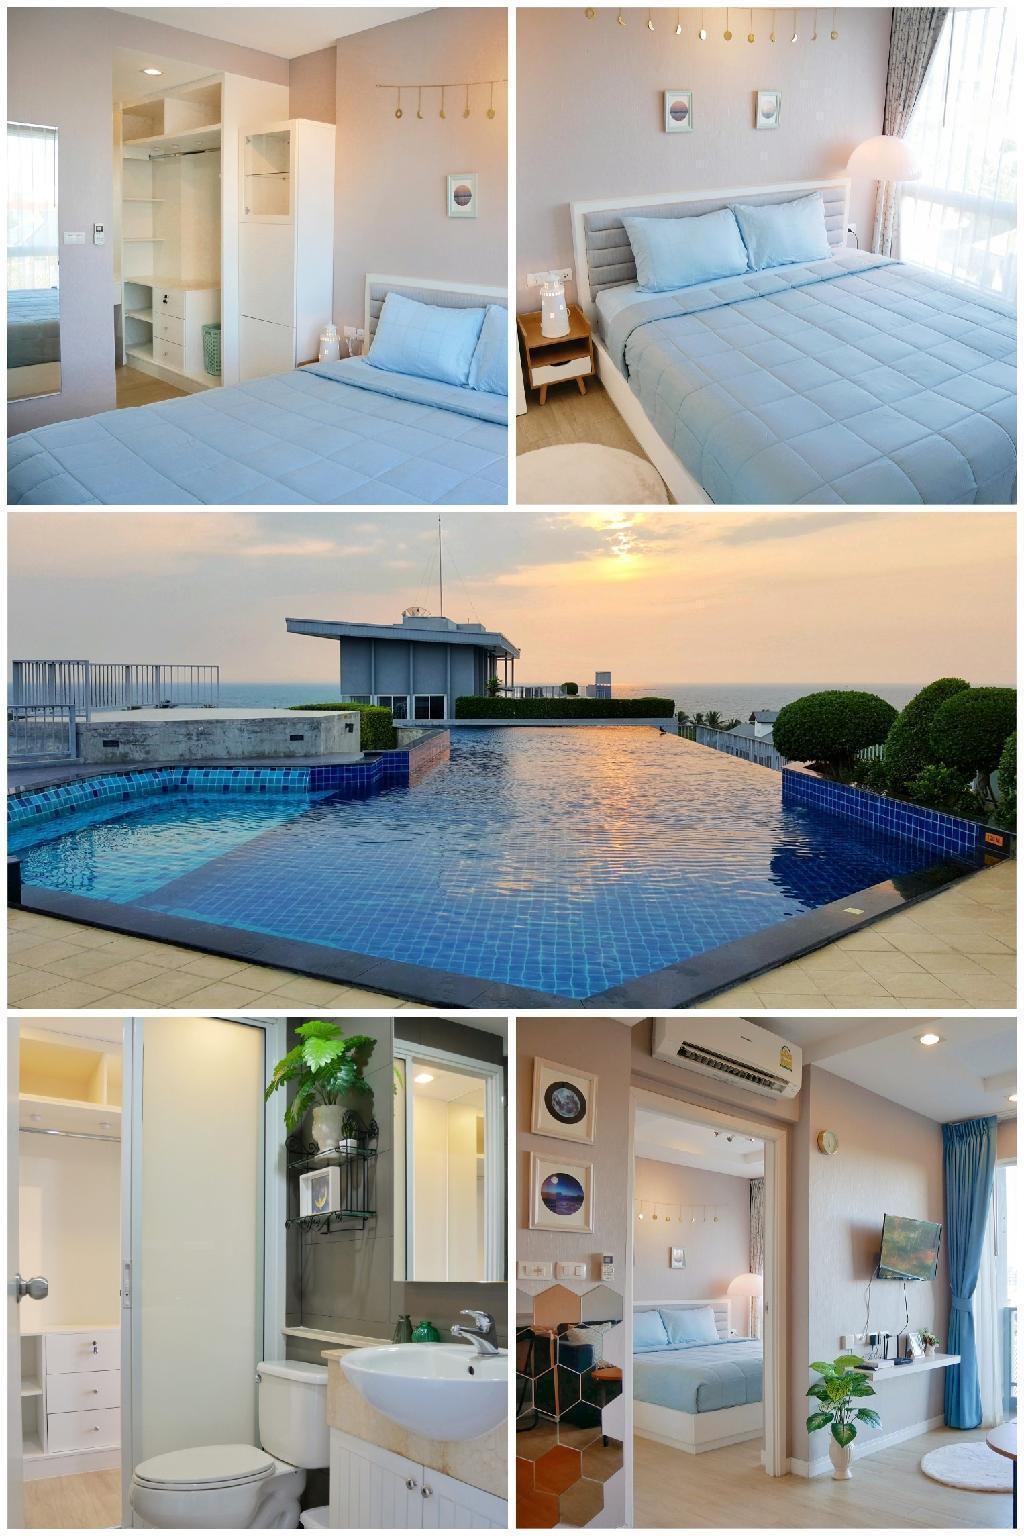 Luxury 1 bedroom & rooftop pool with sea view อพาร์ตเมนต์ 1 ห้องนอน 1 ห้องน้ำส่วนตัว ขนาด 36 ตร.ม. – บางแสน